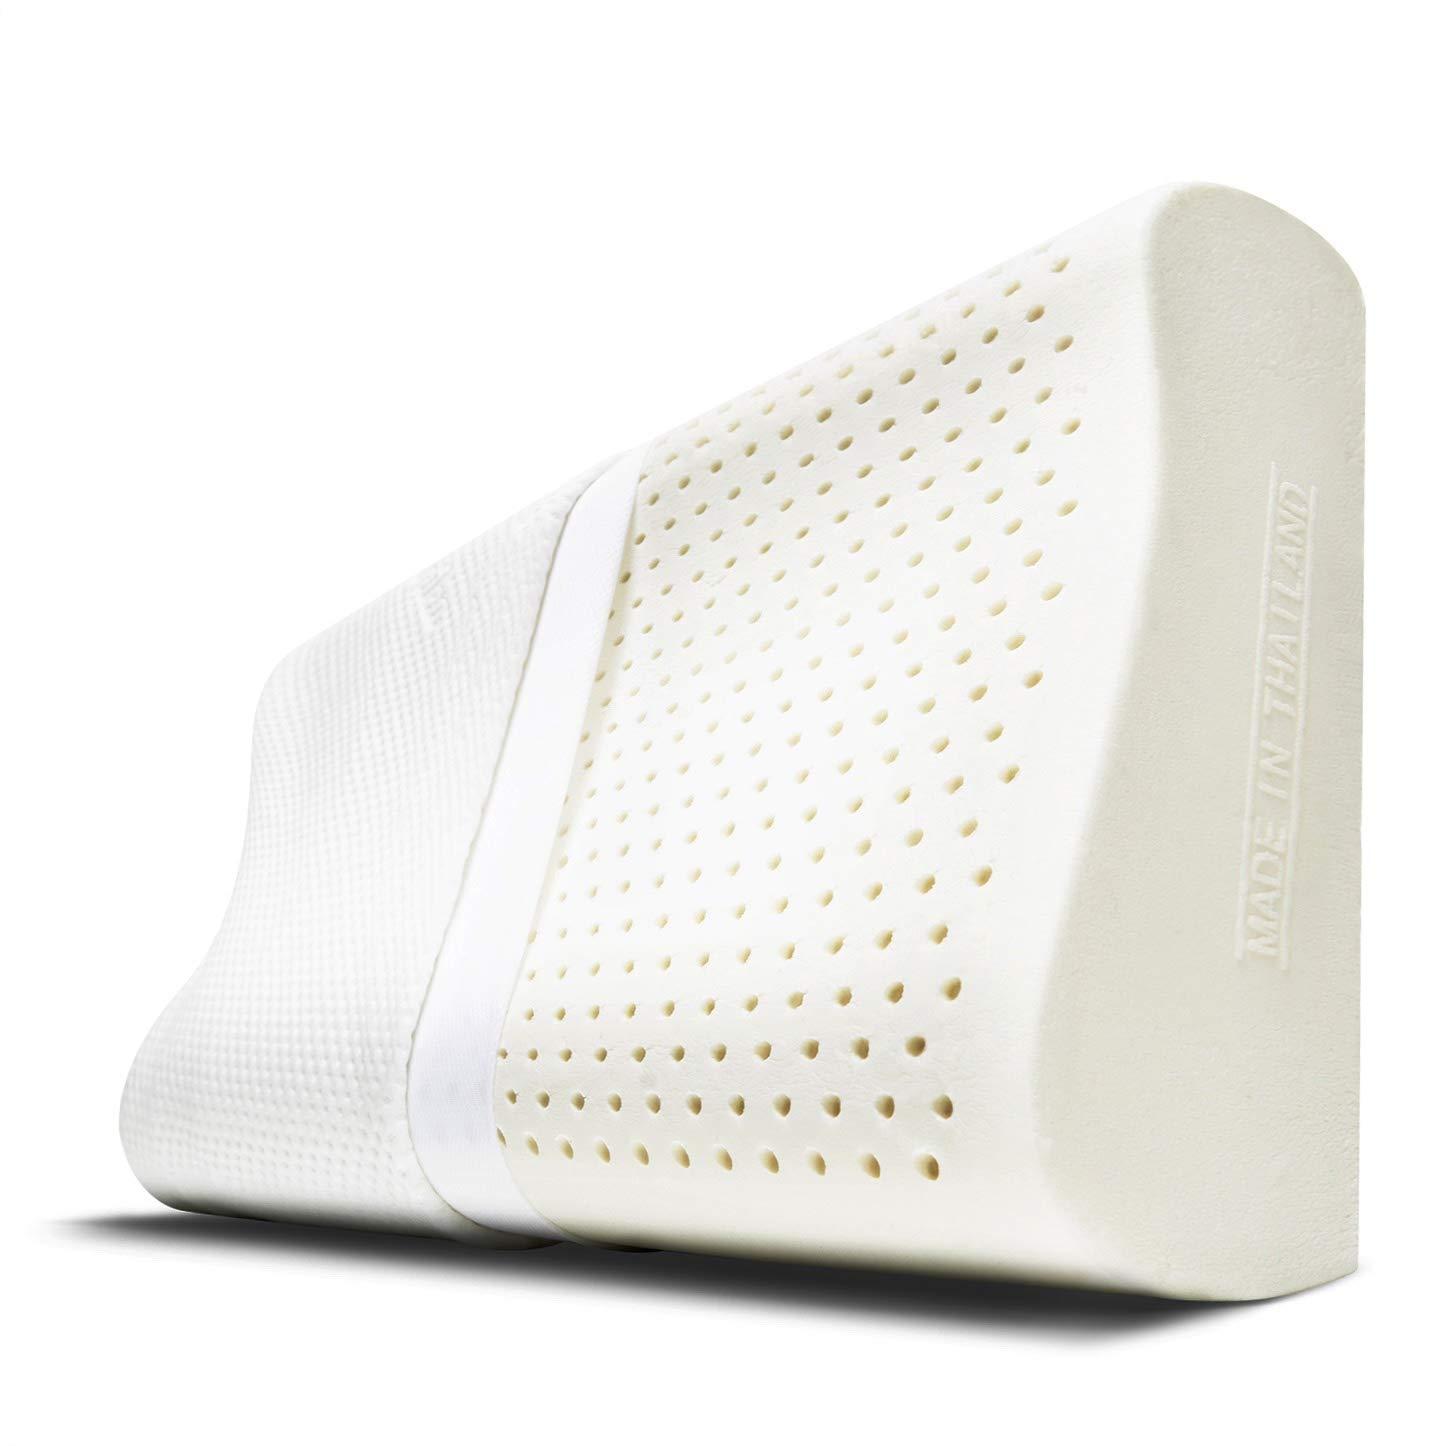 Kannika Revolutionary Latex Pillow for Back Sleepers